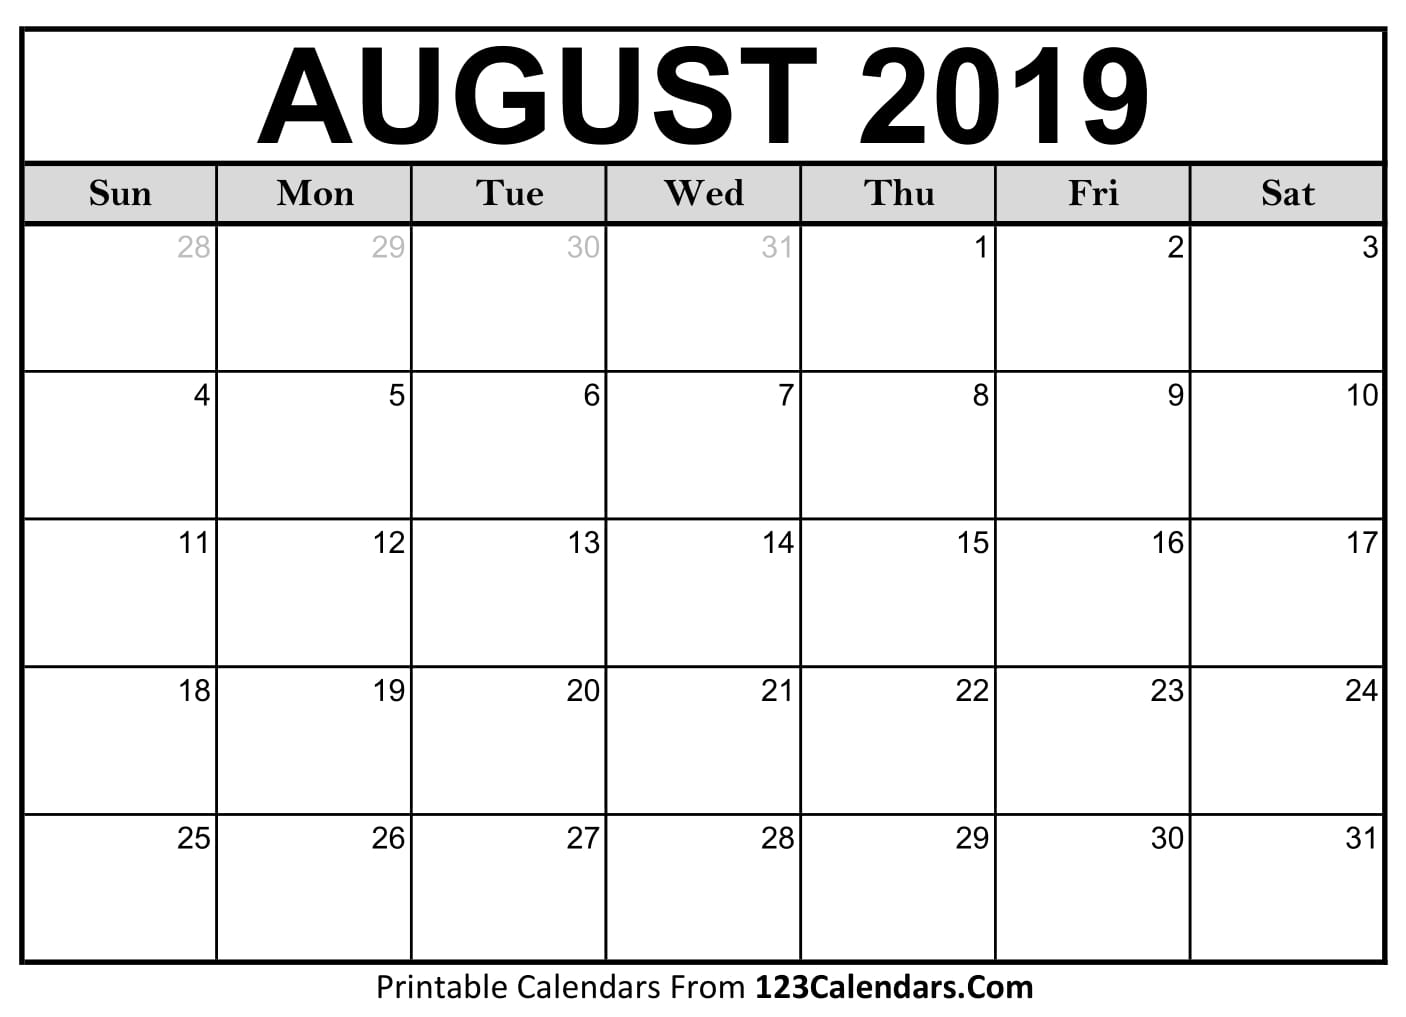 August 2019 Printable Calendar | 123Calendars with regard to Blank Calendars For August